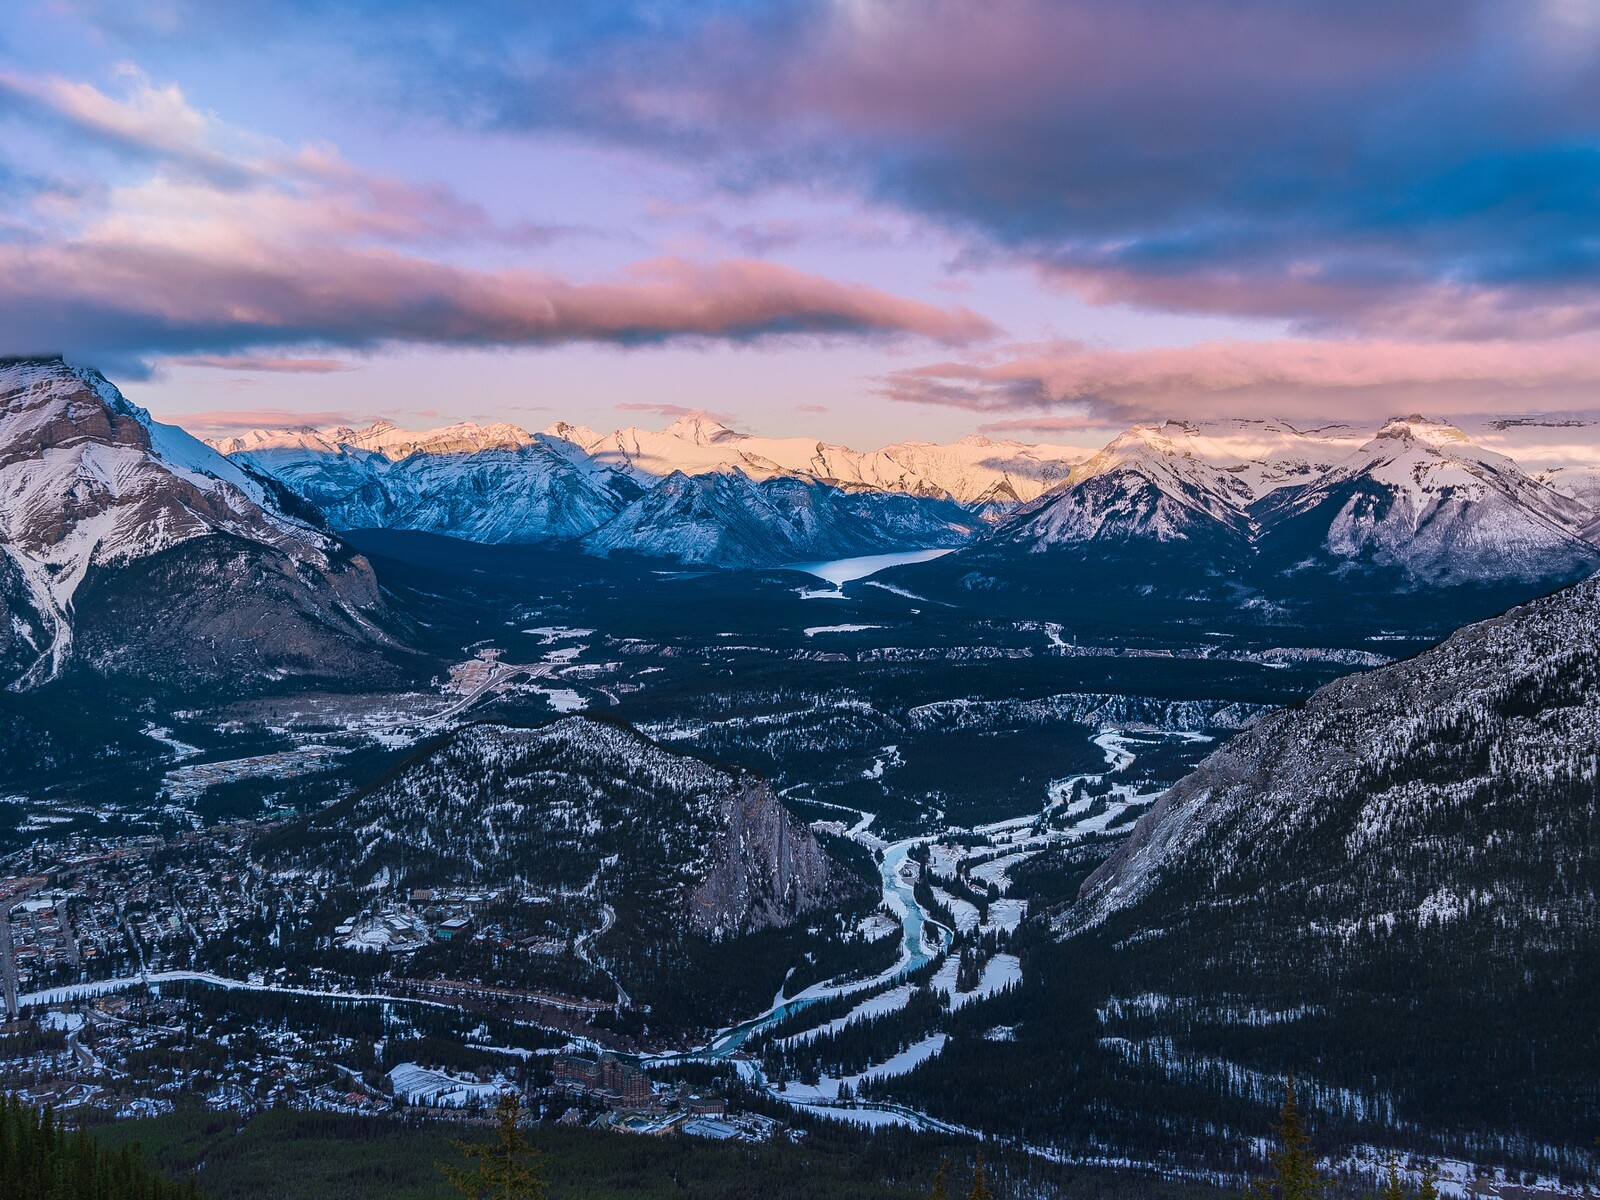 1600x1200 Mountains 4k Snow 1600x1200 Resolution HD 4k ...